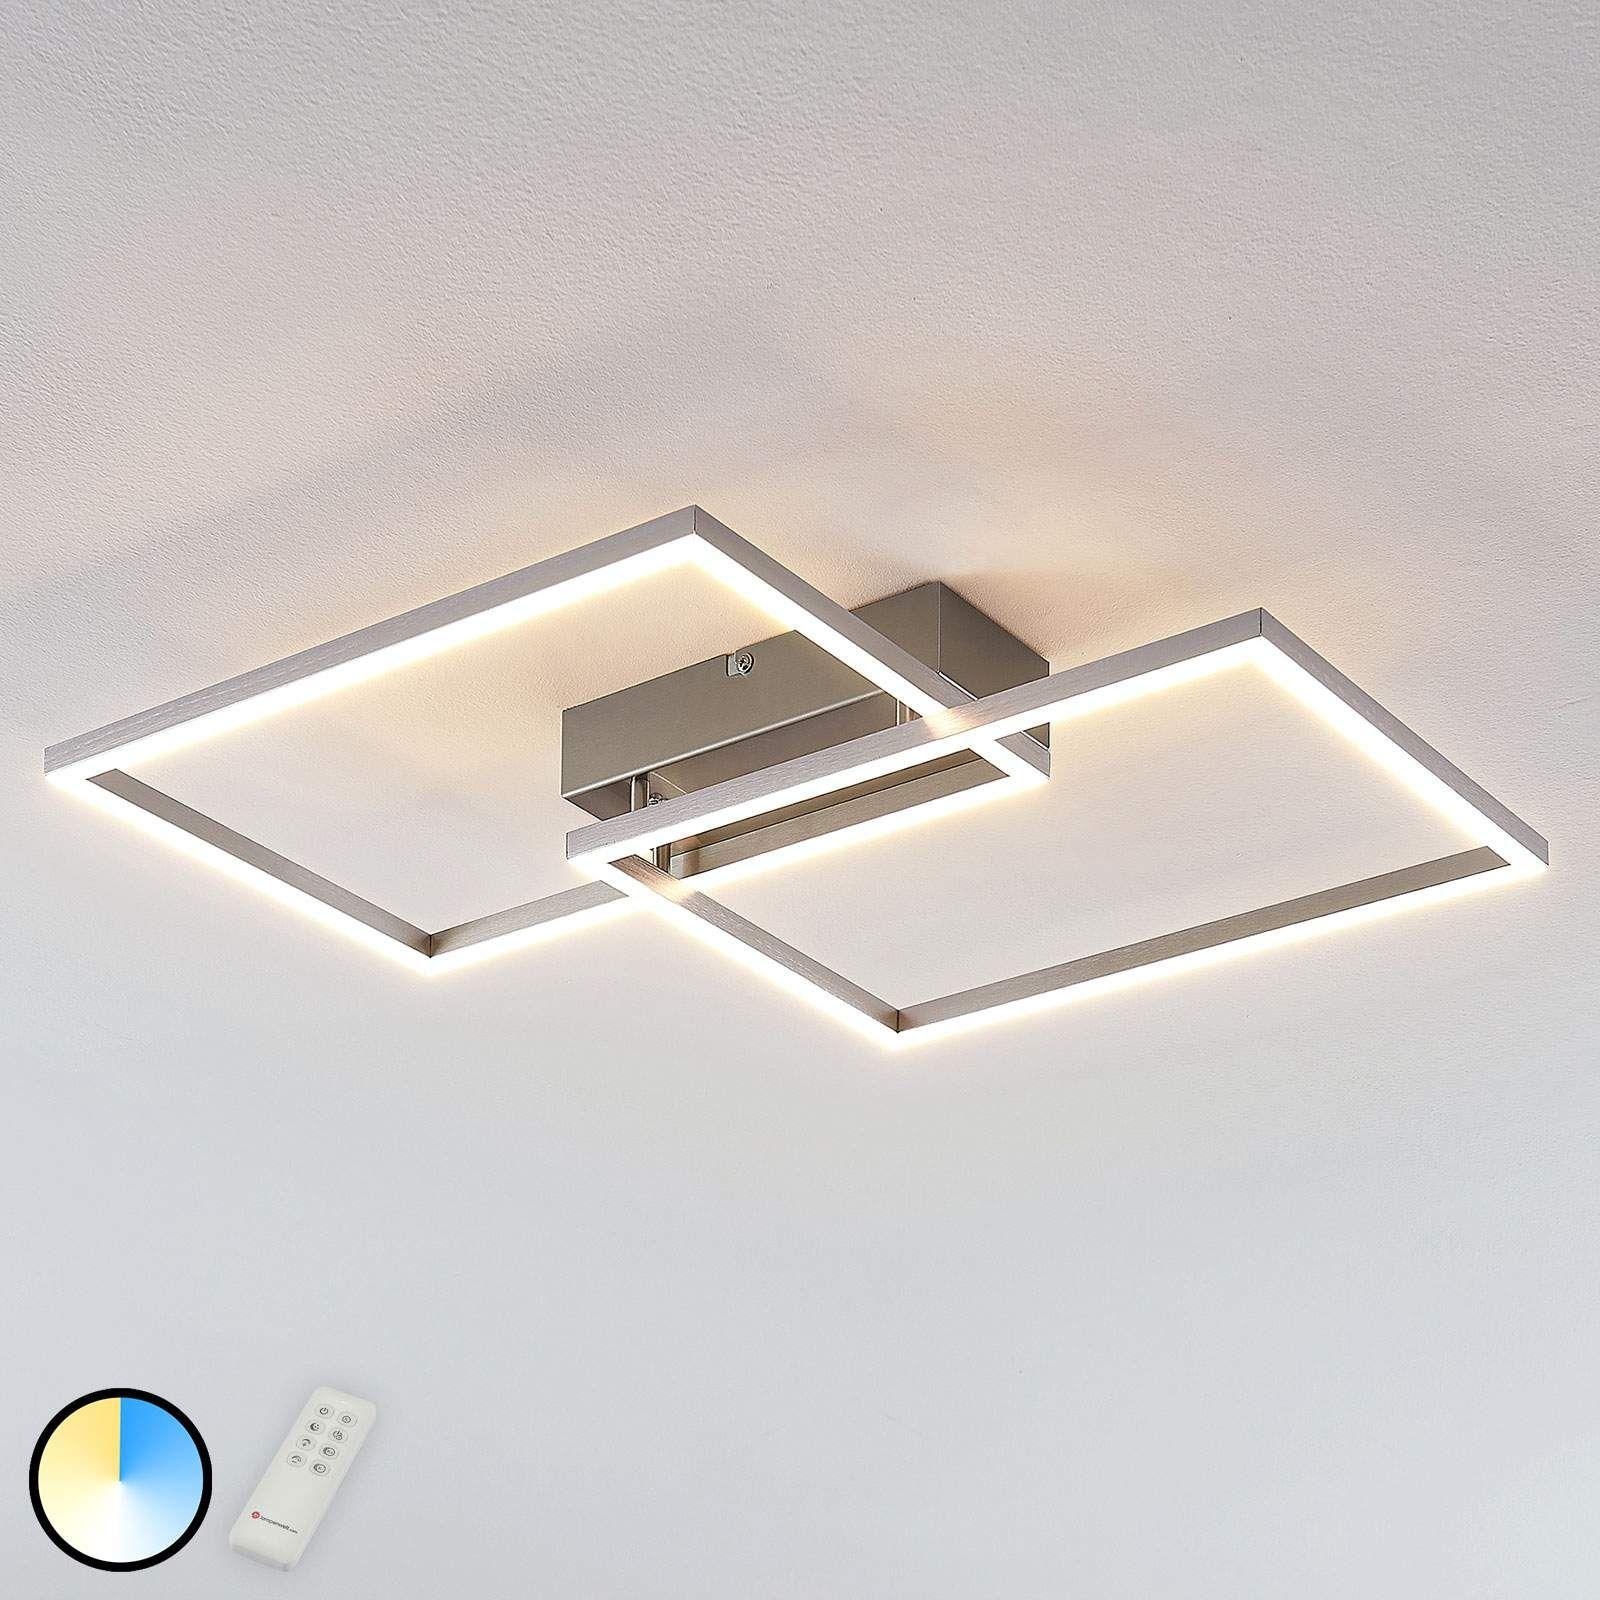 Led Deckenleuchte Quadra Dimmbar 2 Flg 50 Cm In 2020 Led Deckenlampen Beleuchtung Decke Led Deckenleuchte